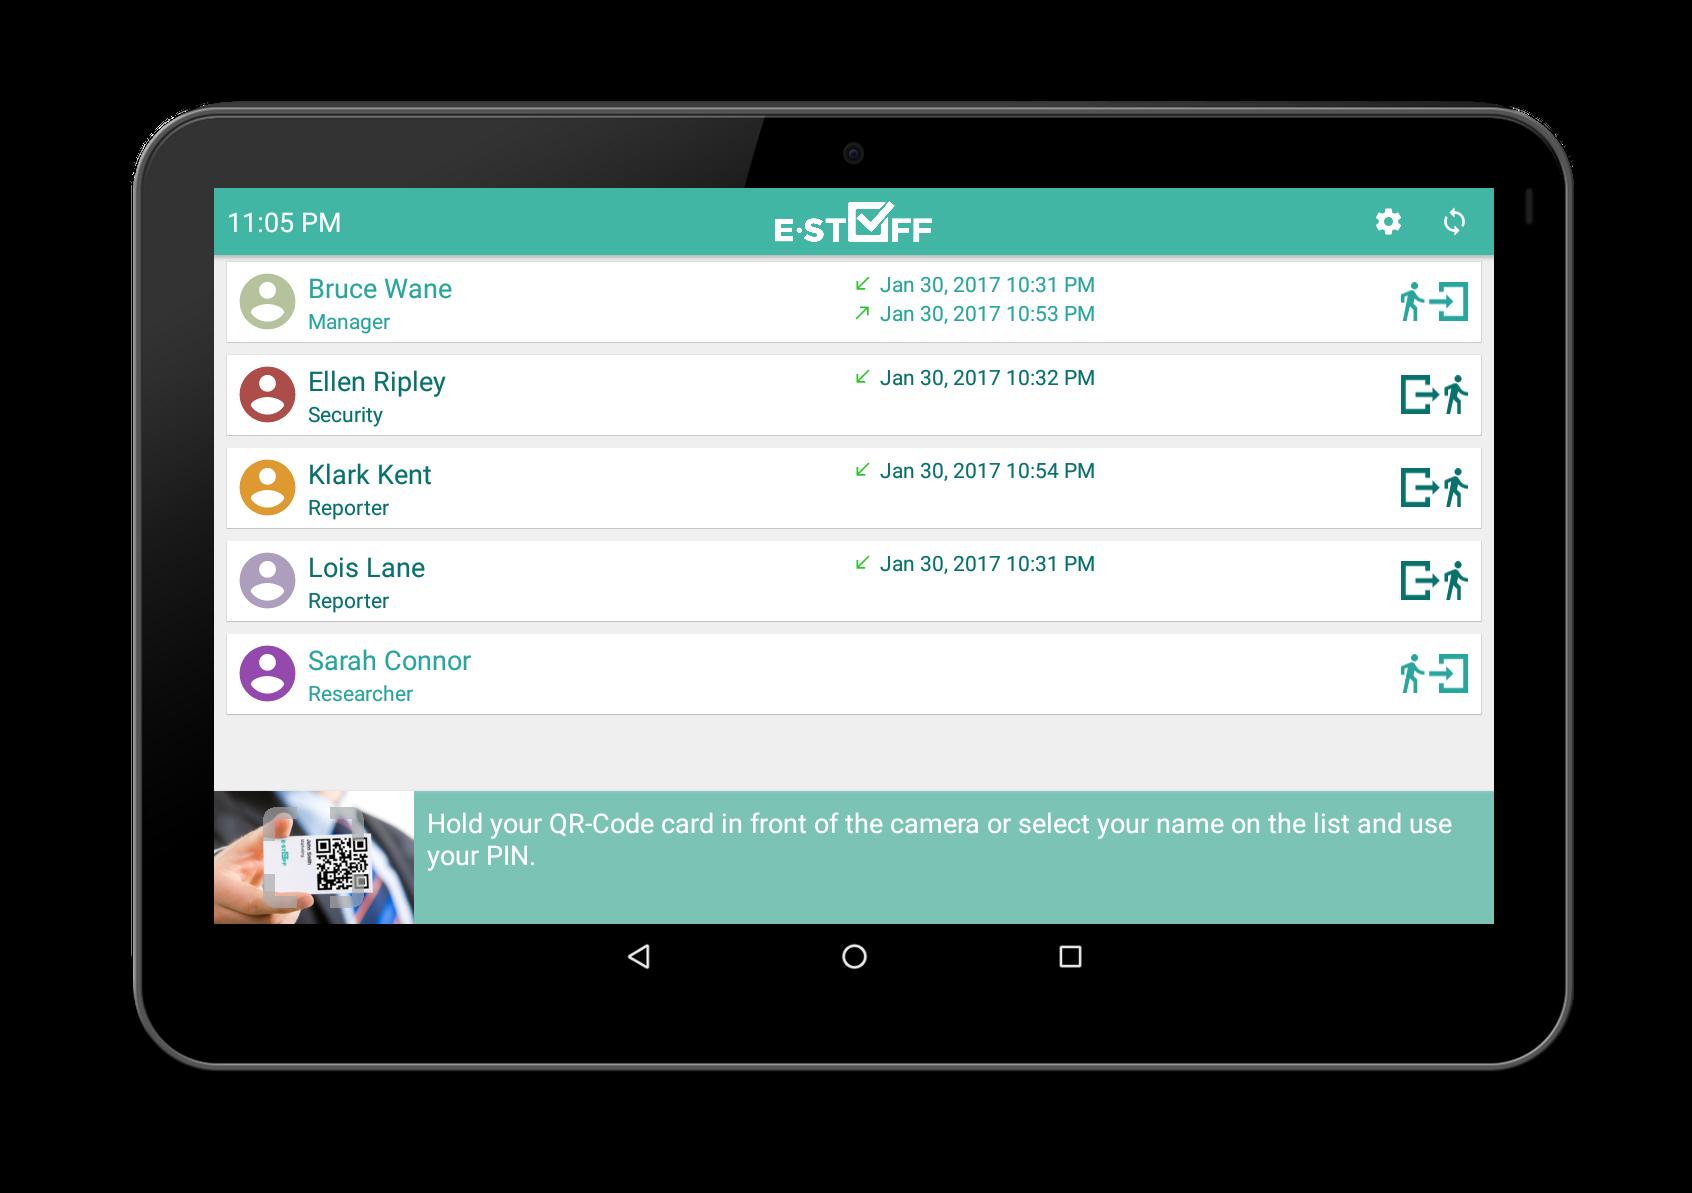 estaff time and attendance cloud platform